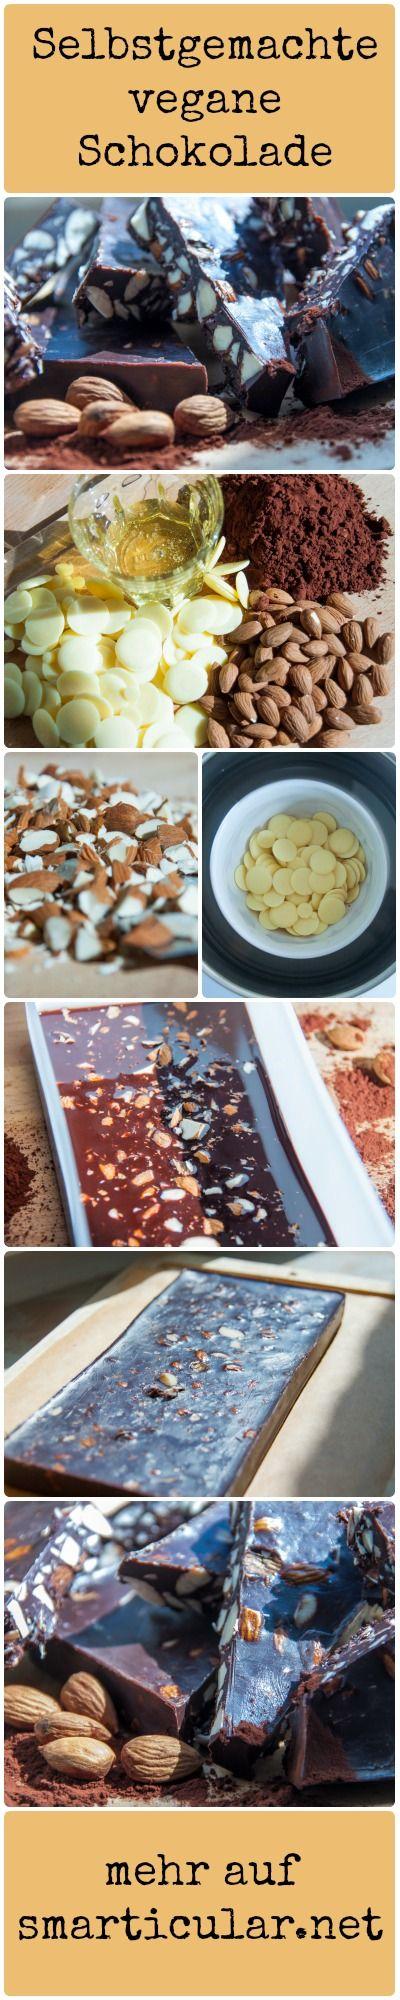 schokolade veganer and vegane schokolade on pinterest. Black Bedroom Furniture Sets. Home Design Ideas